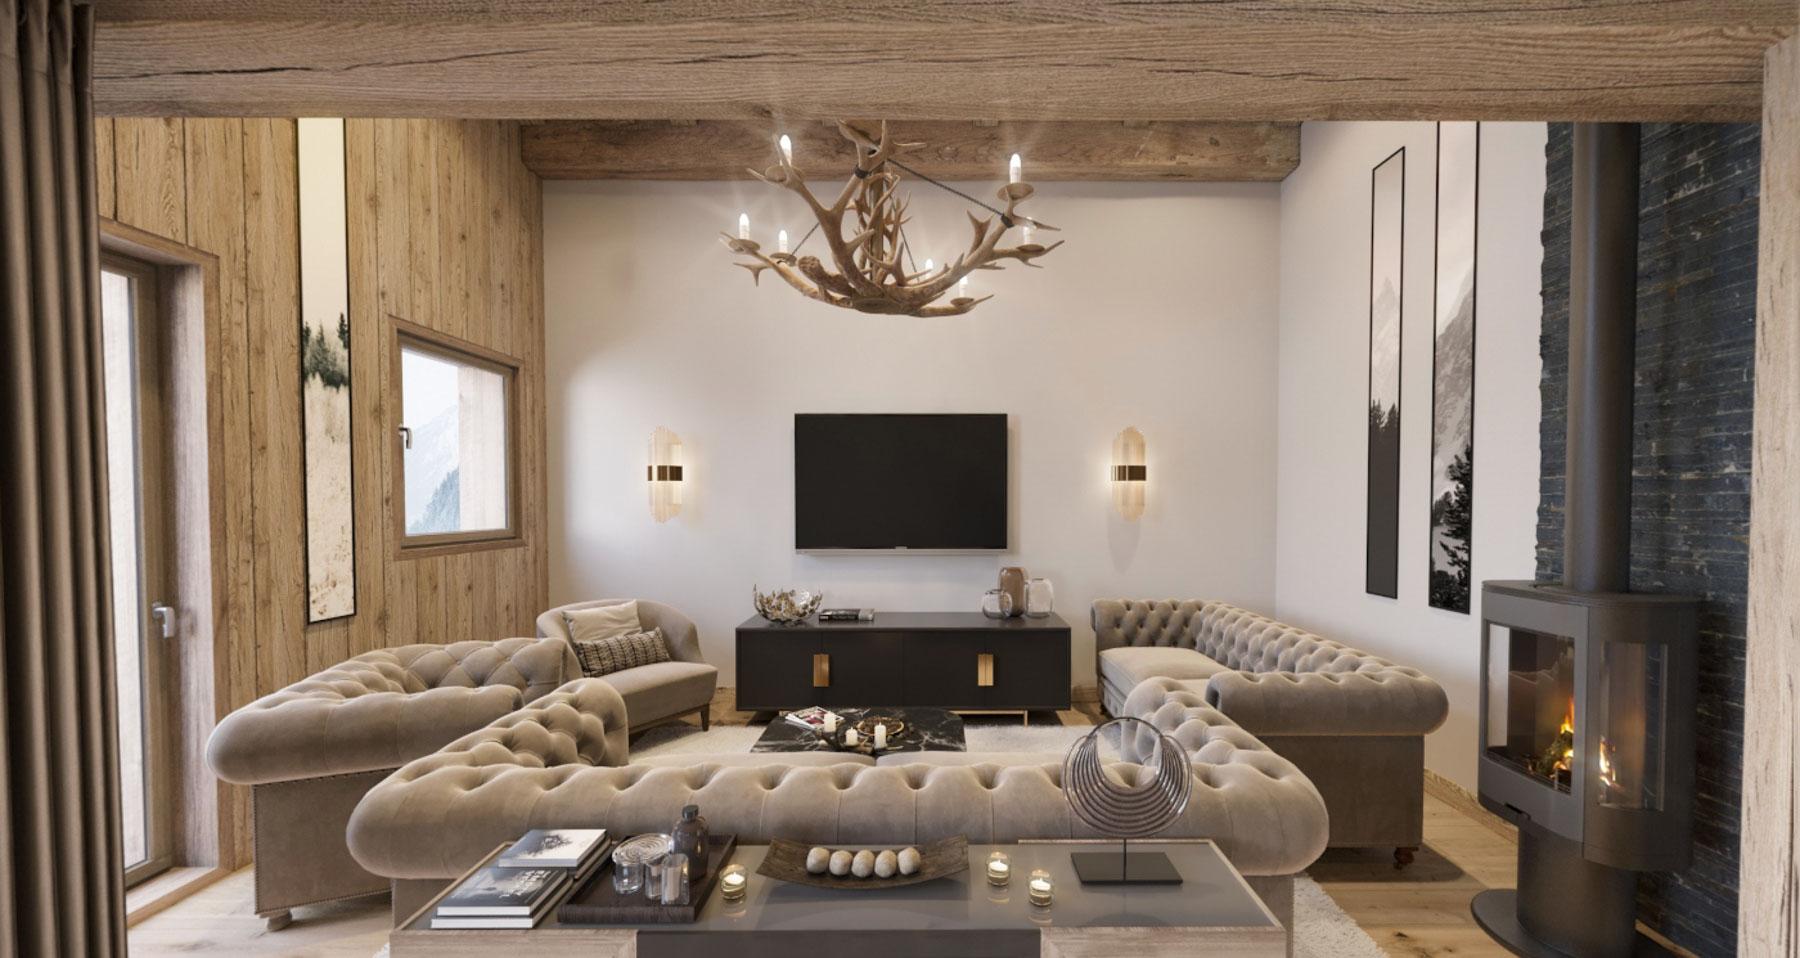 Gite Blanc Example Sitting Room